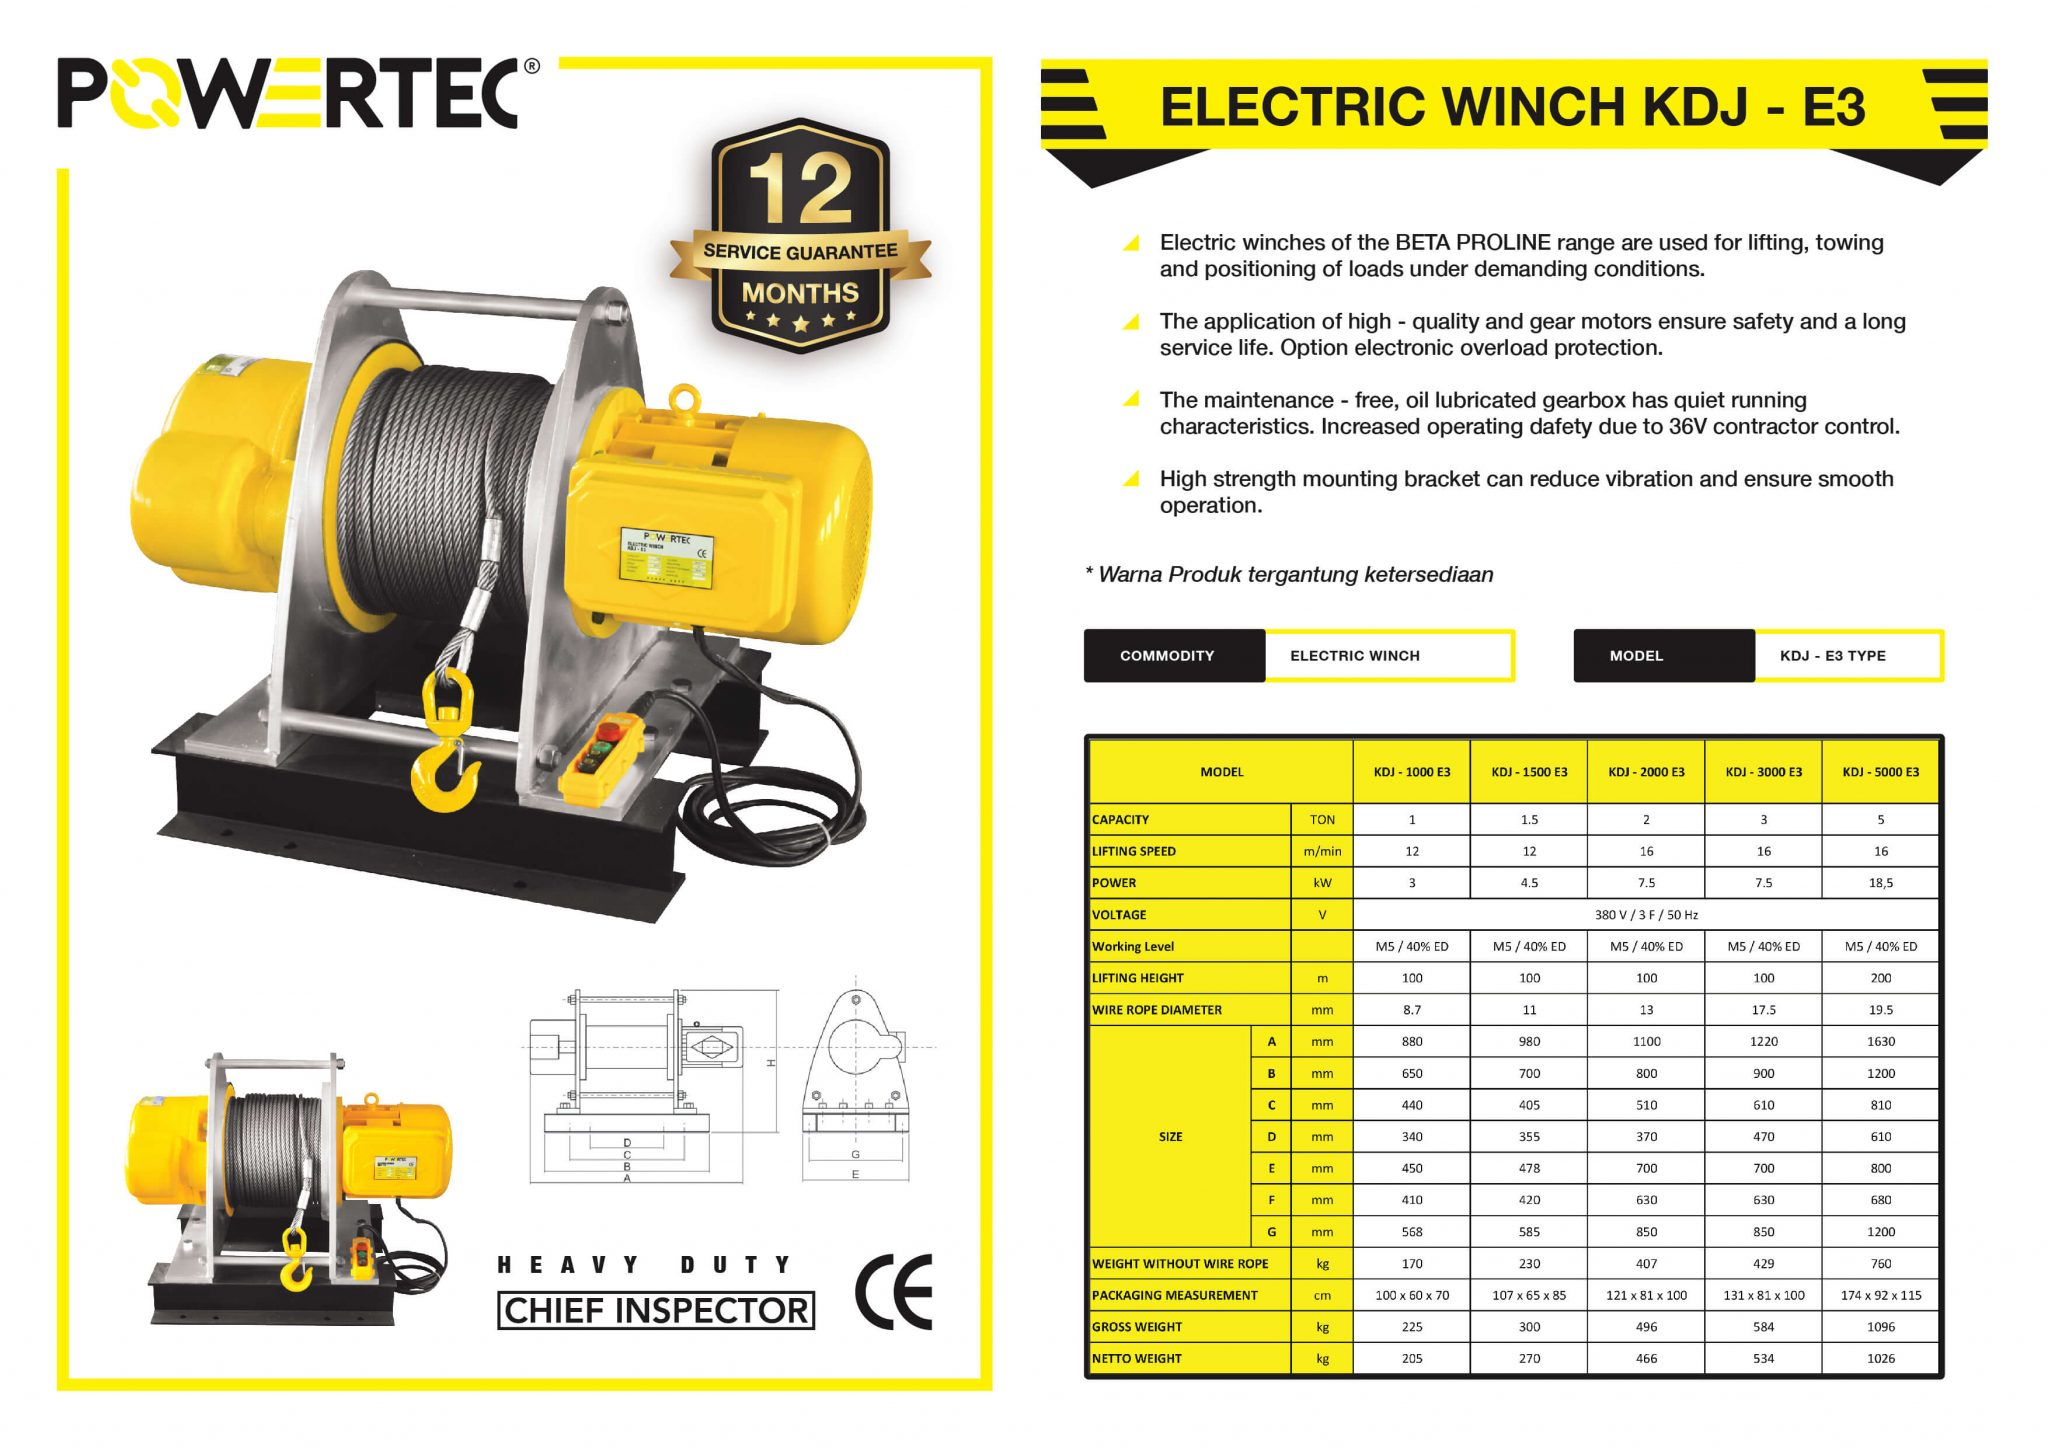 POWERTEC ELECTRIC WINCH KDJ-E3 HD BROCHURE